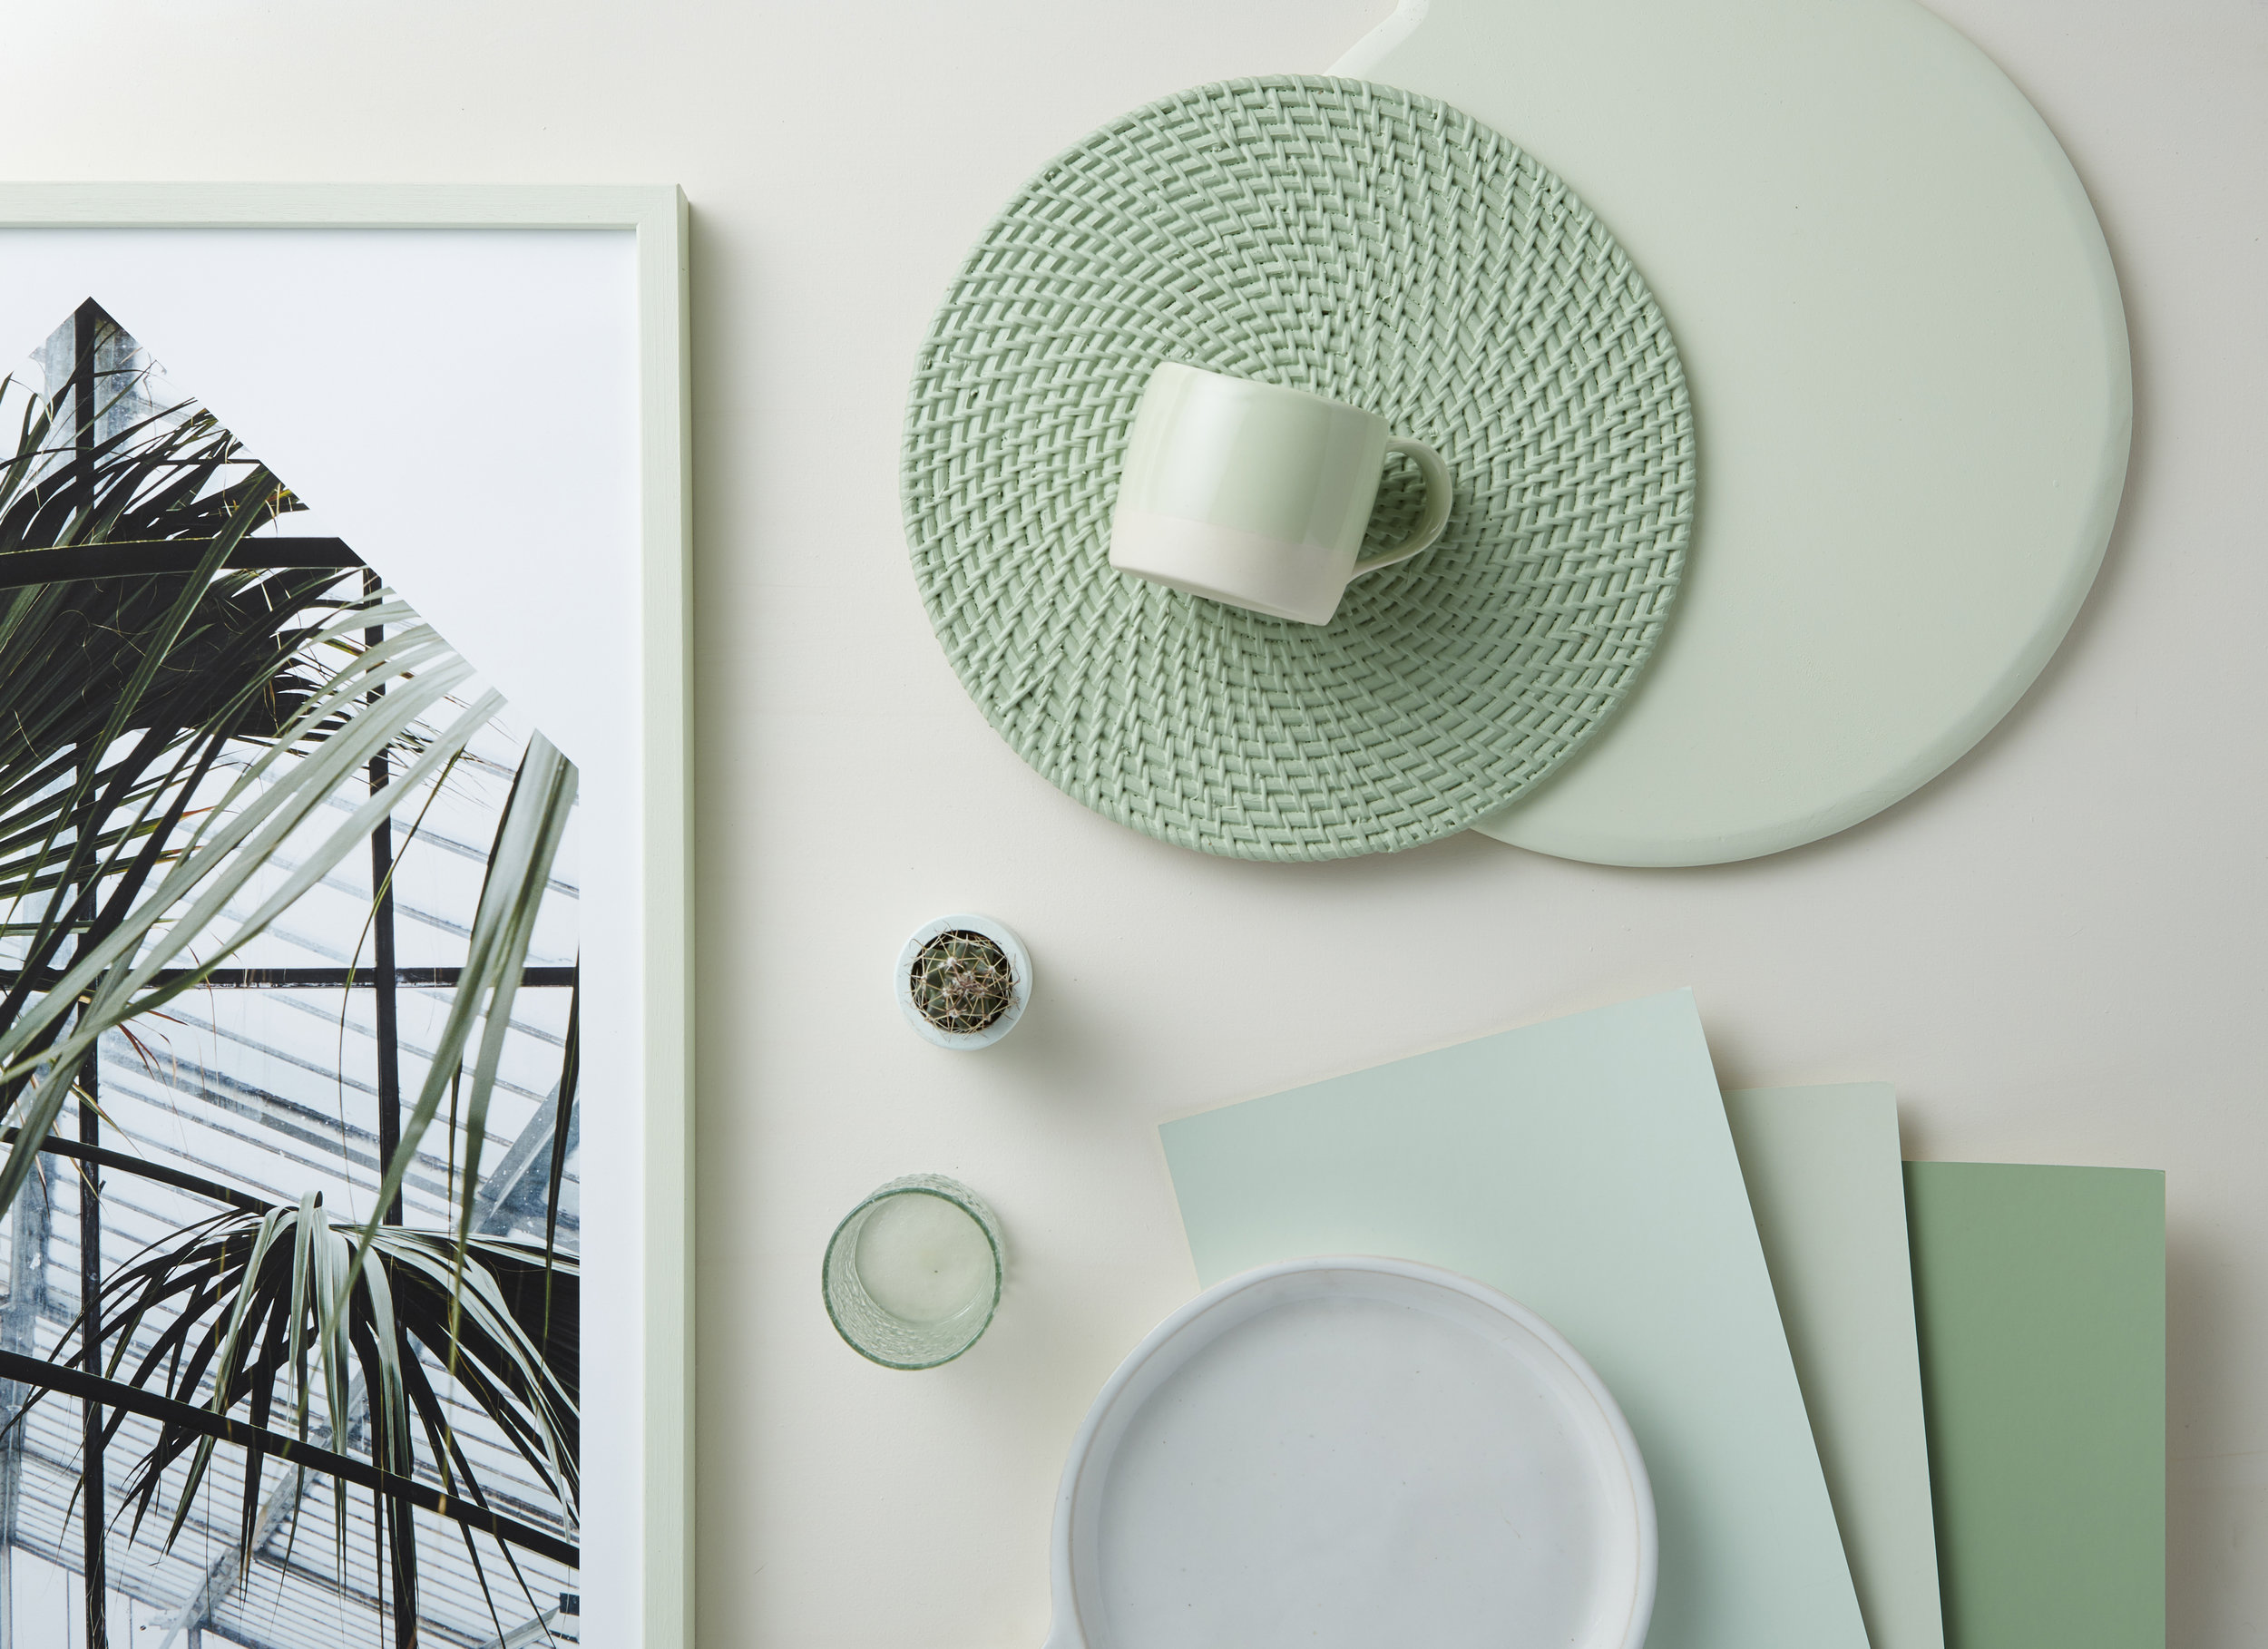 Kate Alexander,flat lay, Resene  Spanish White+Whitewash+Poured Milk+Nourish+Kandinsky+Aura, photo Bryce Carleton.jpg